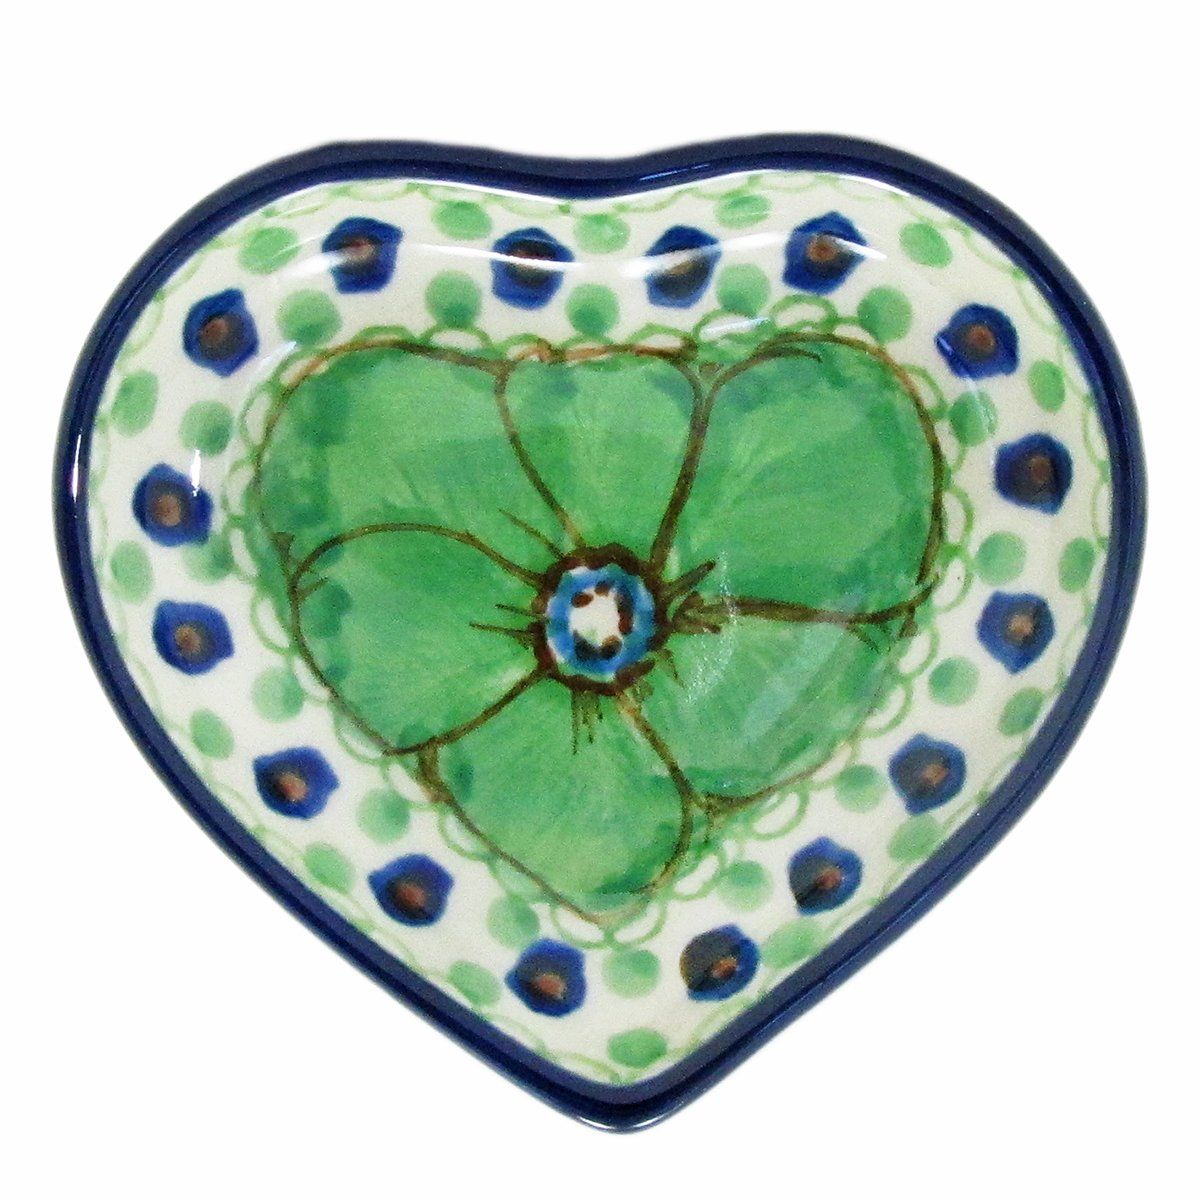 Polish Pottery 3'' Heart Dish Handmade Poland Signature Limited Edition Pattern B64-408A